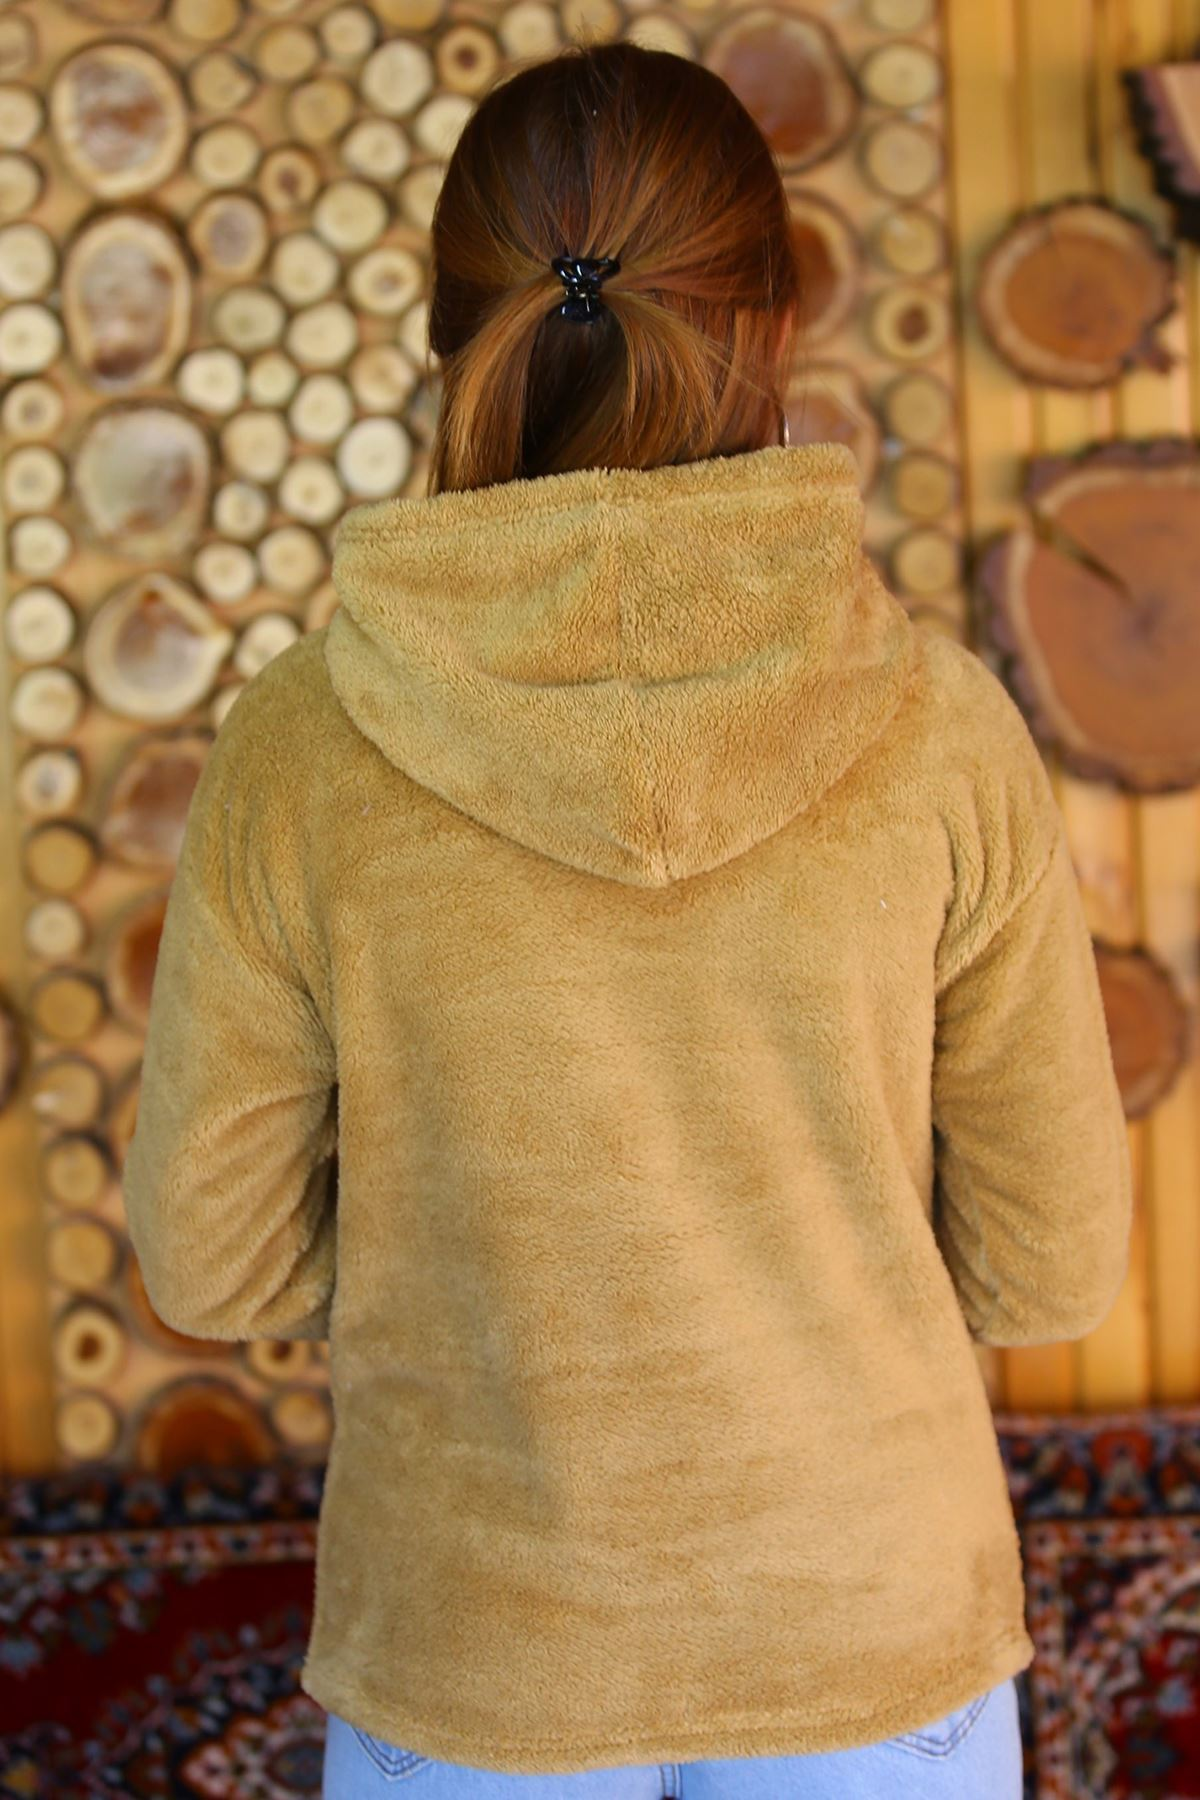 Kanguru Cepli Sweat Camel - 4463.1153. - y.s